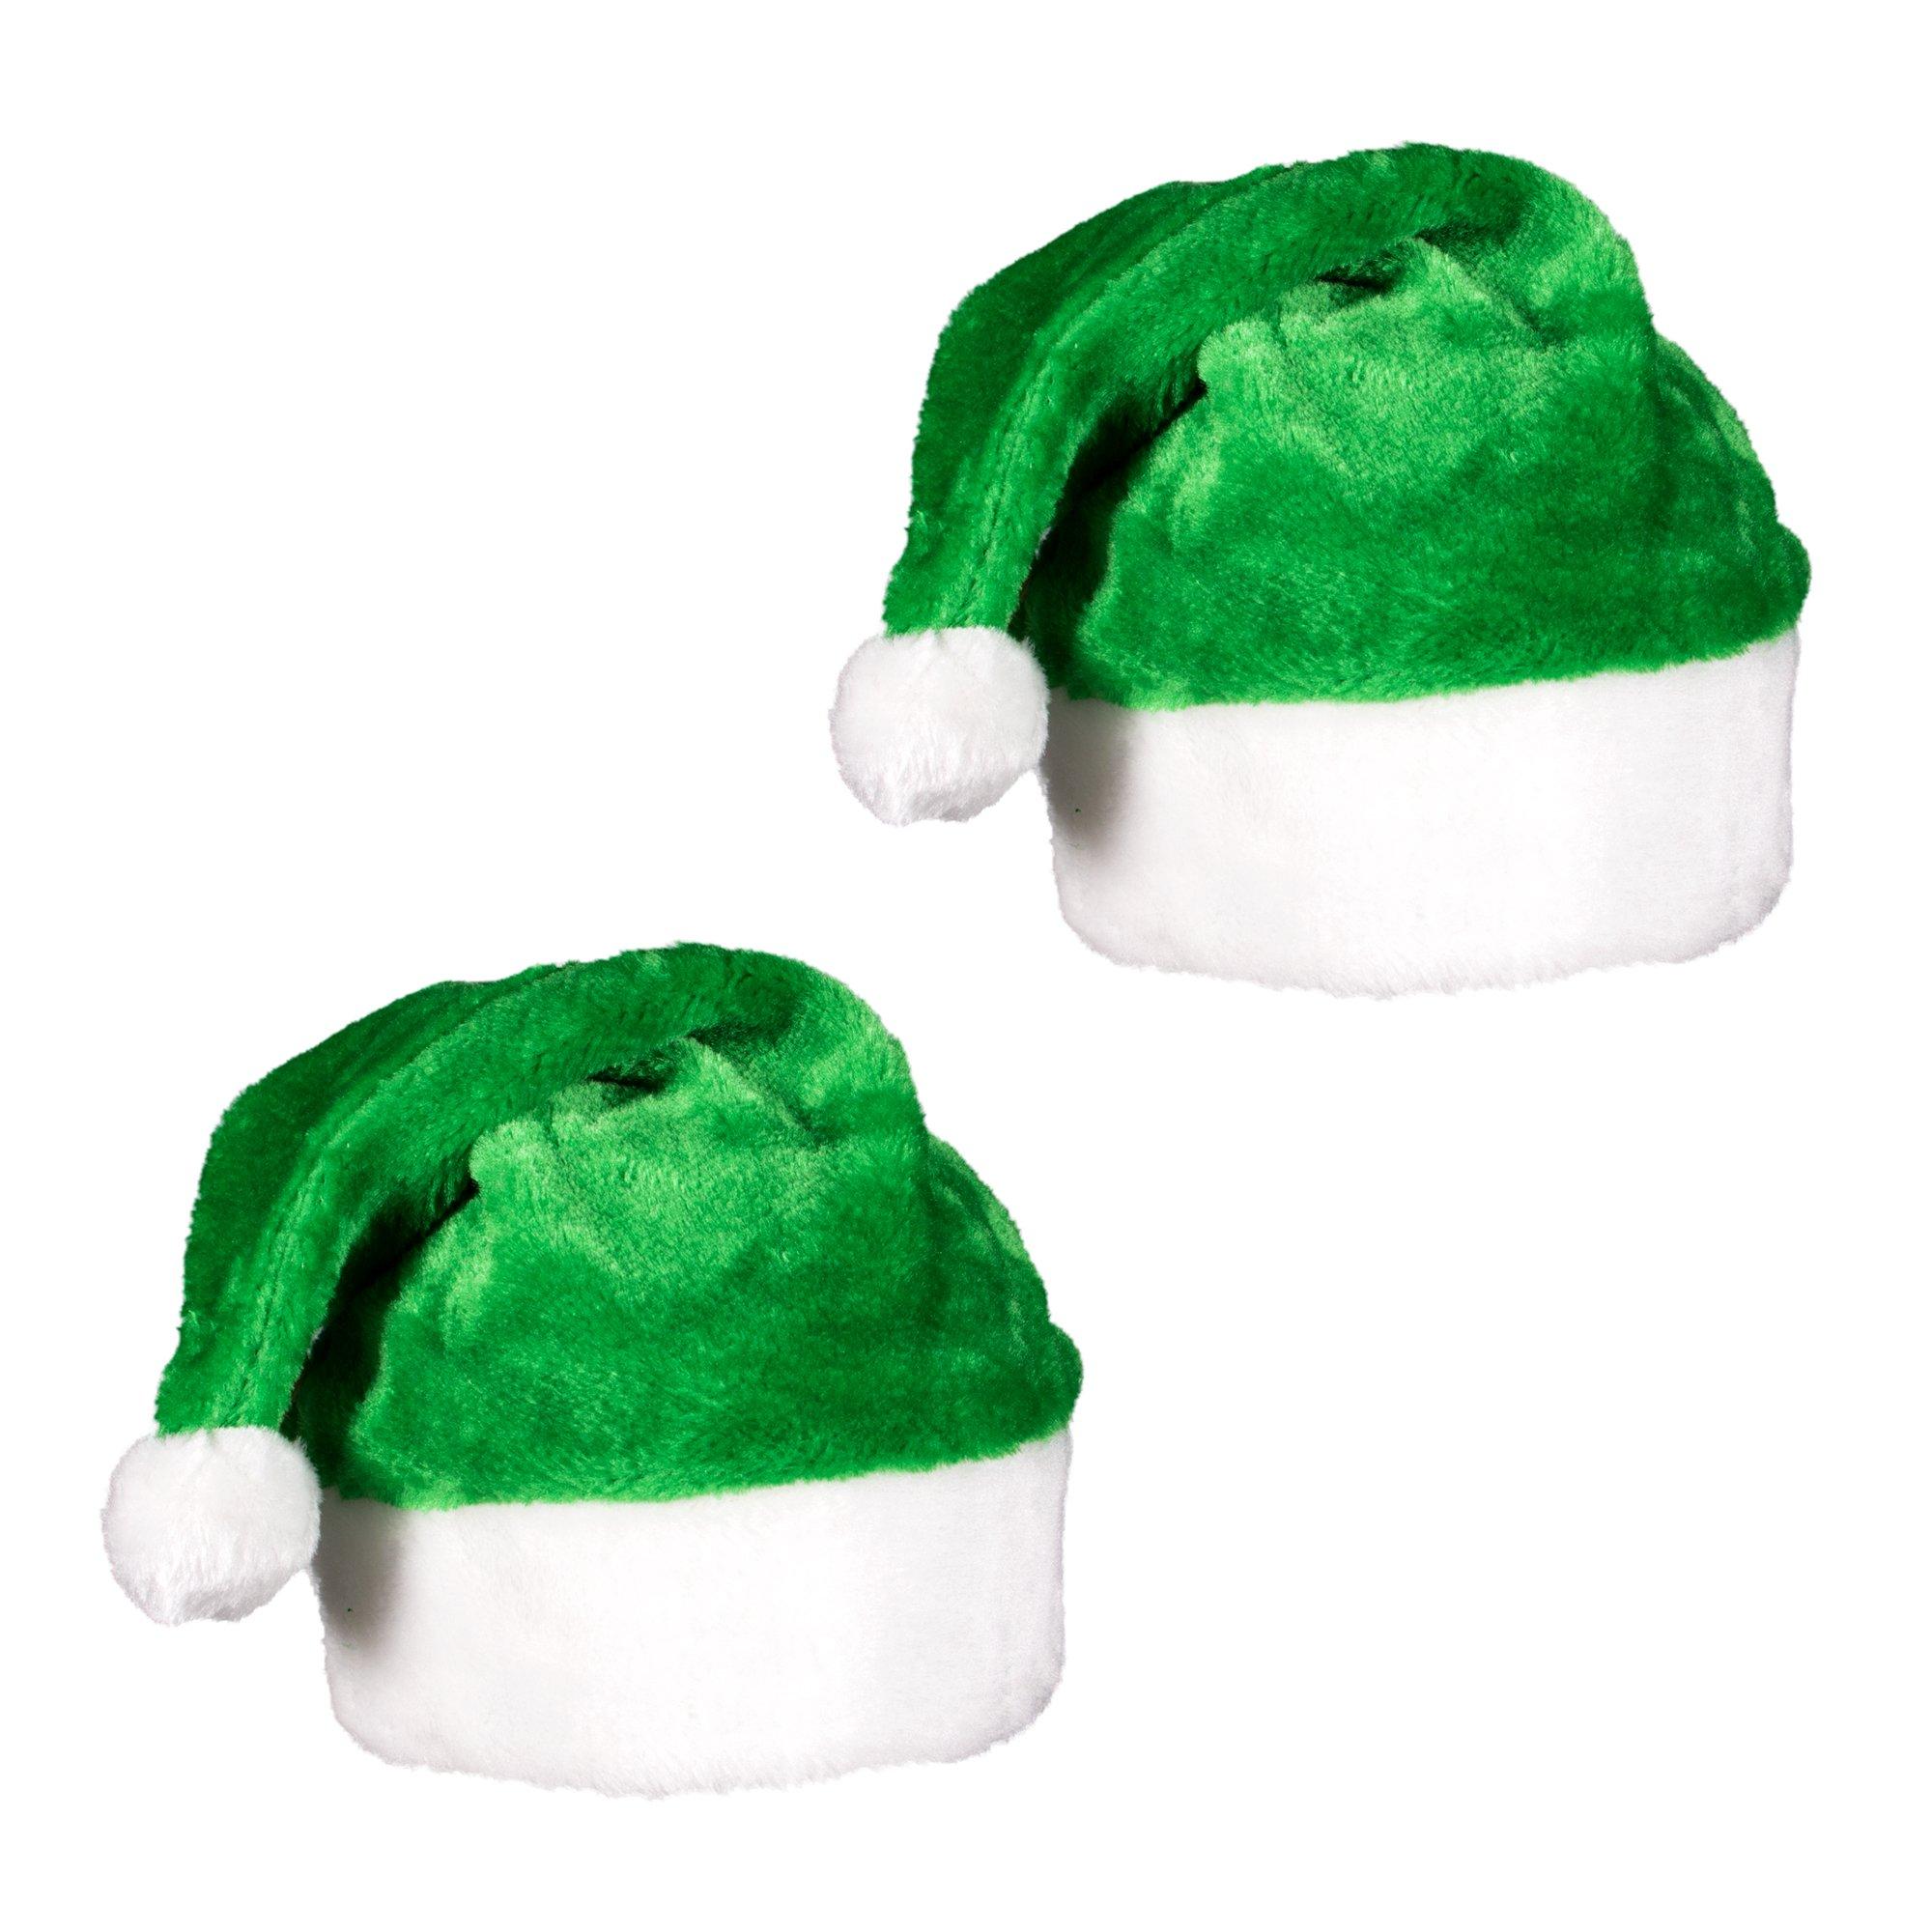 Amazon.com  (2 Pack) Blue Plush Holiday Christmas Santa Hats  Health ... 785310de7edc